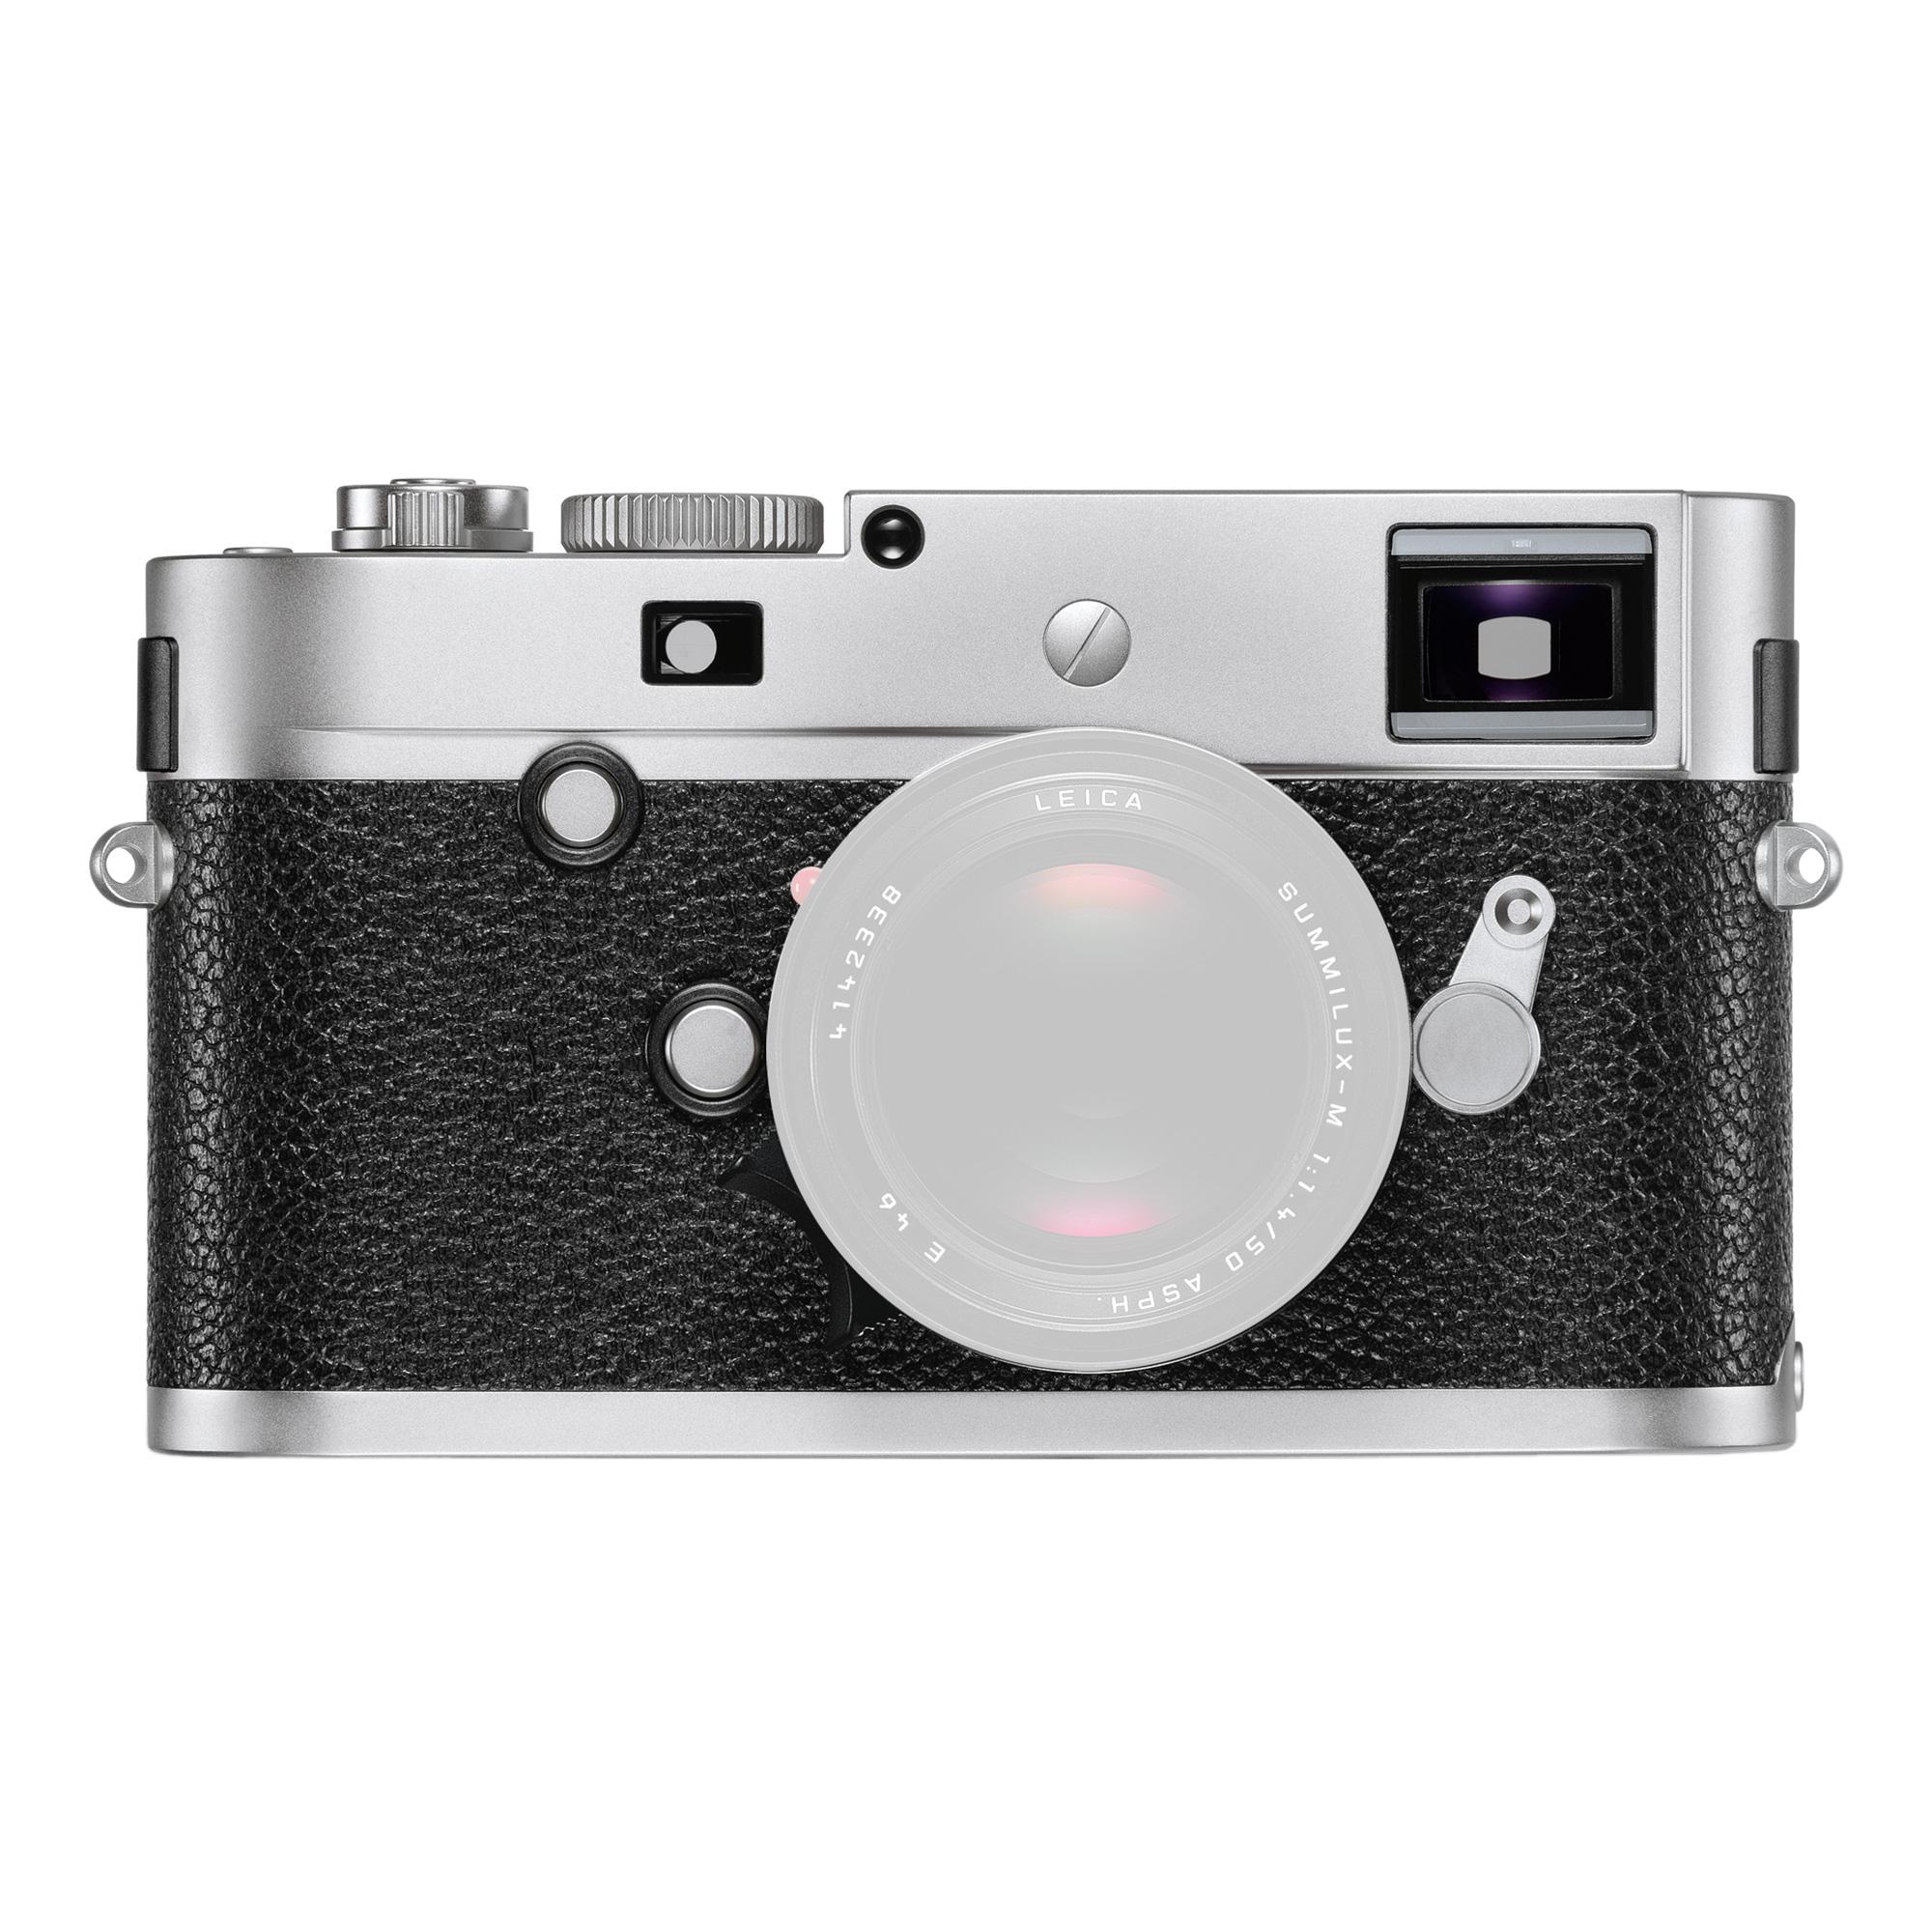 Image of Leica M-P Digital Rangefinder Camera Body (Silver)